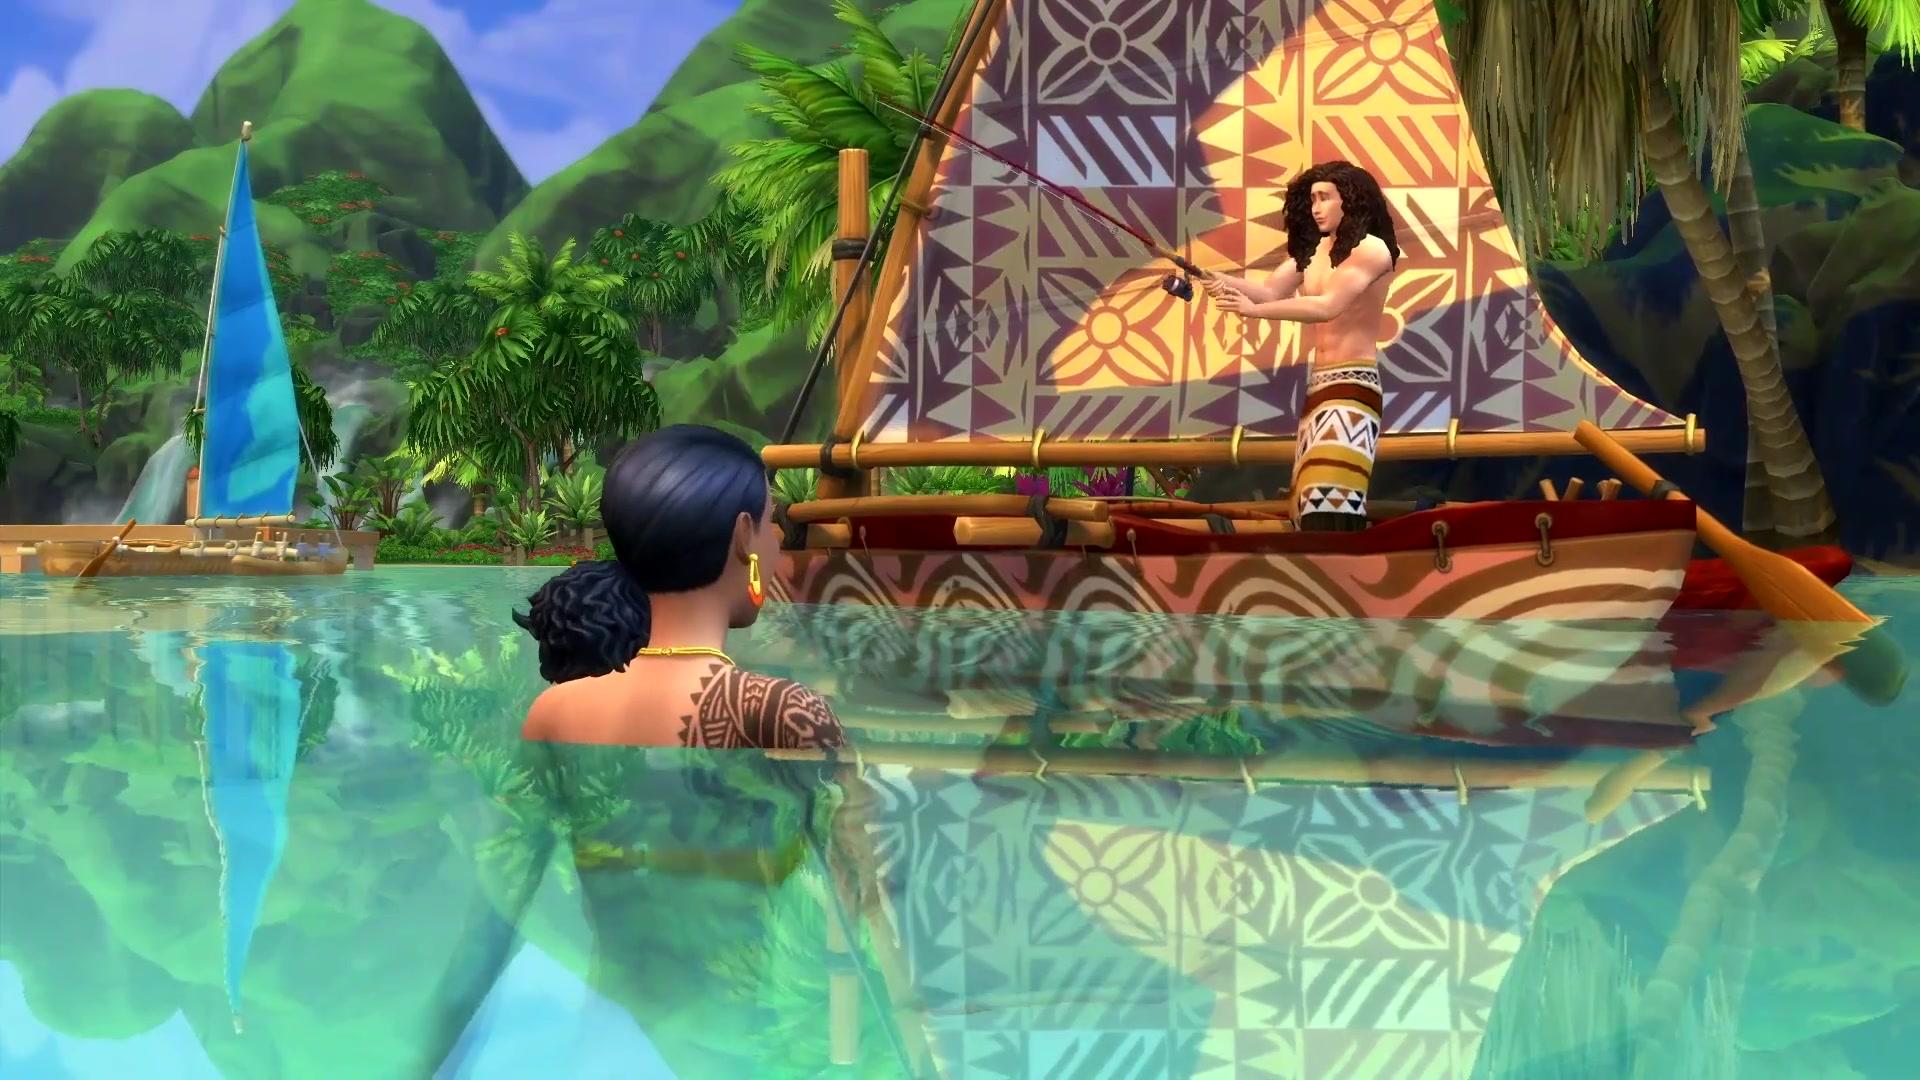 How The Sims 4's Island Living team built secret mermaids and better